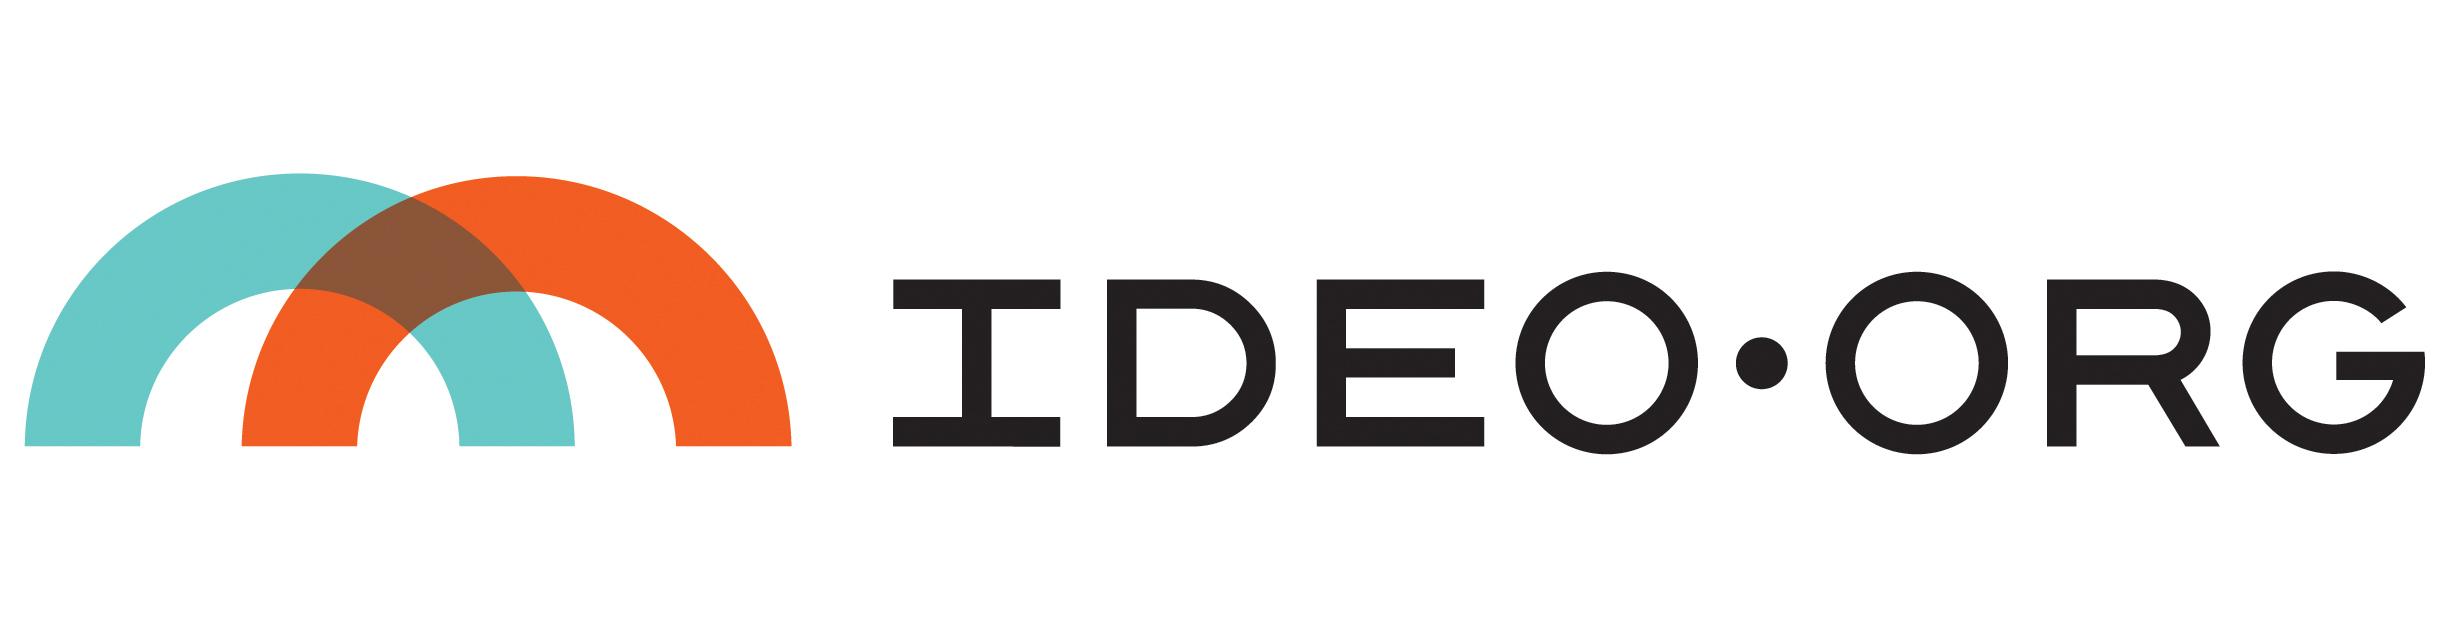 IDEOorg_logo_web.jpg